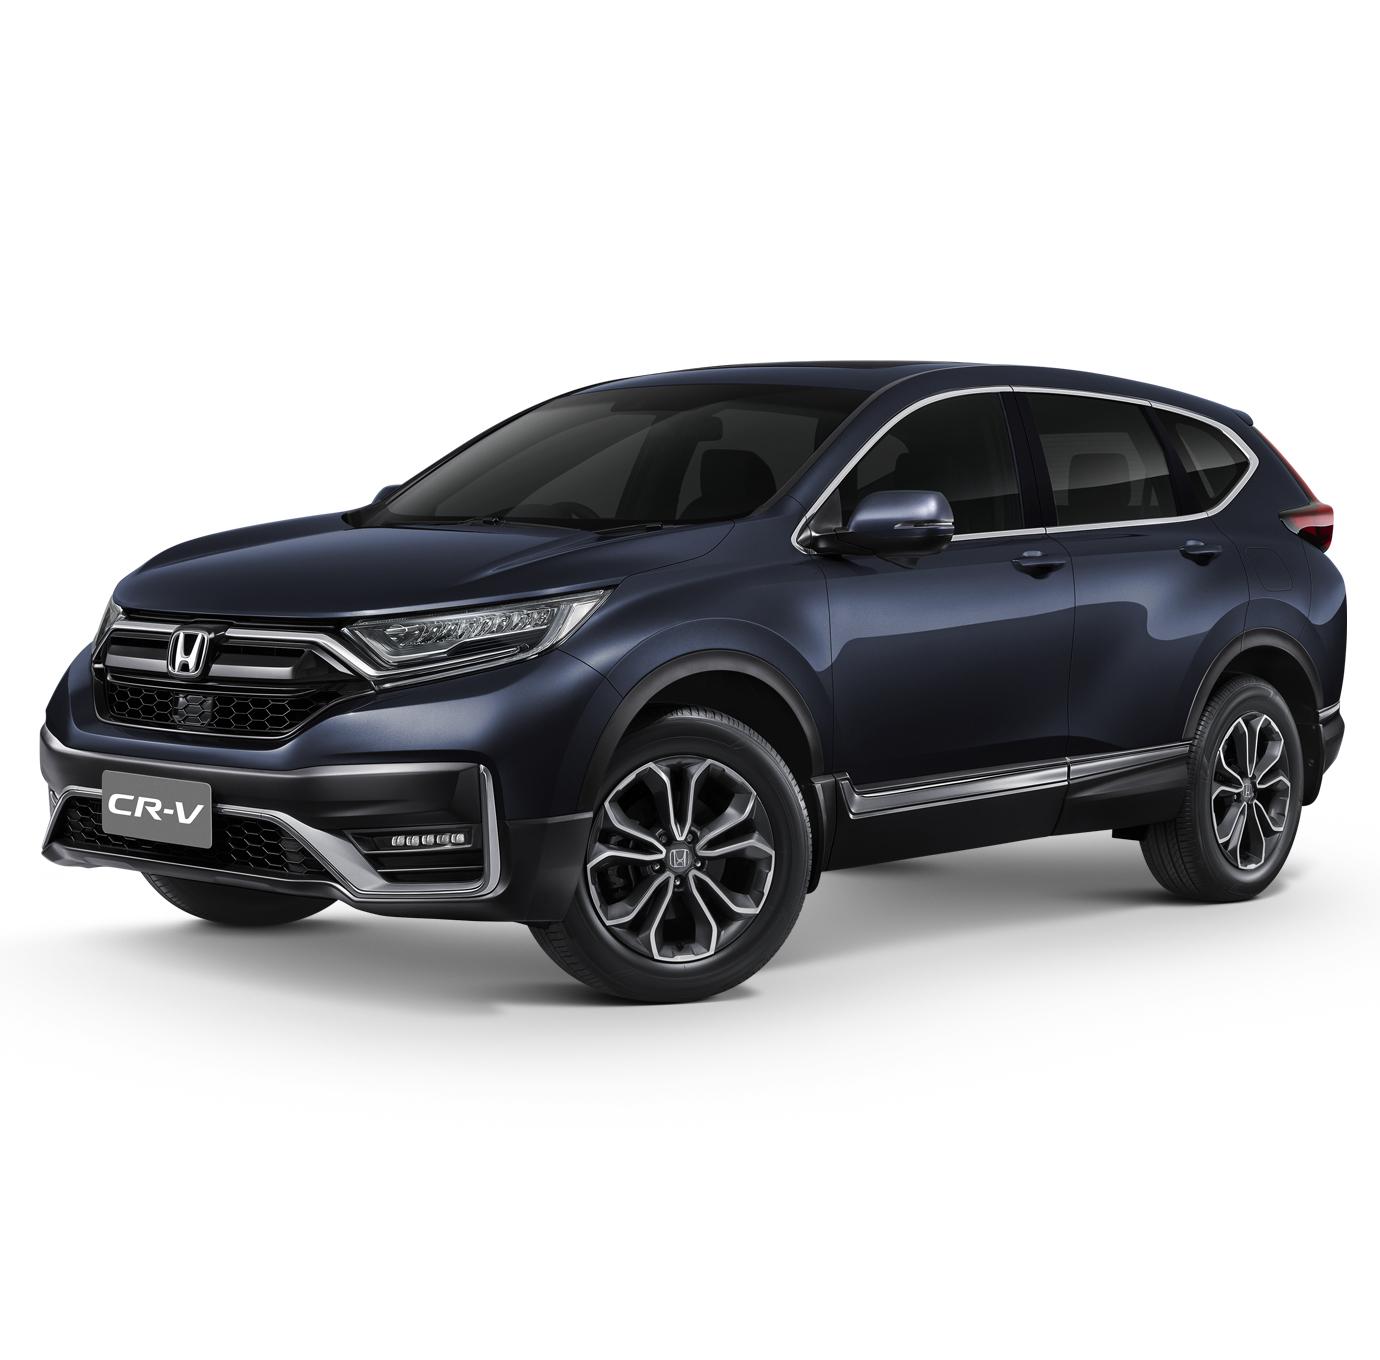 Honda CRV 2020